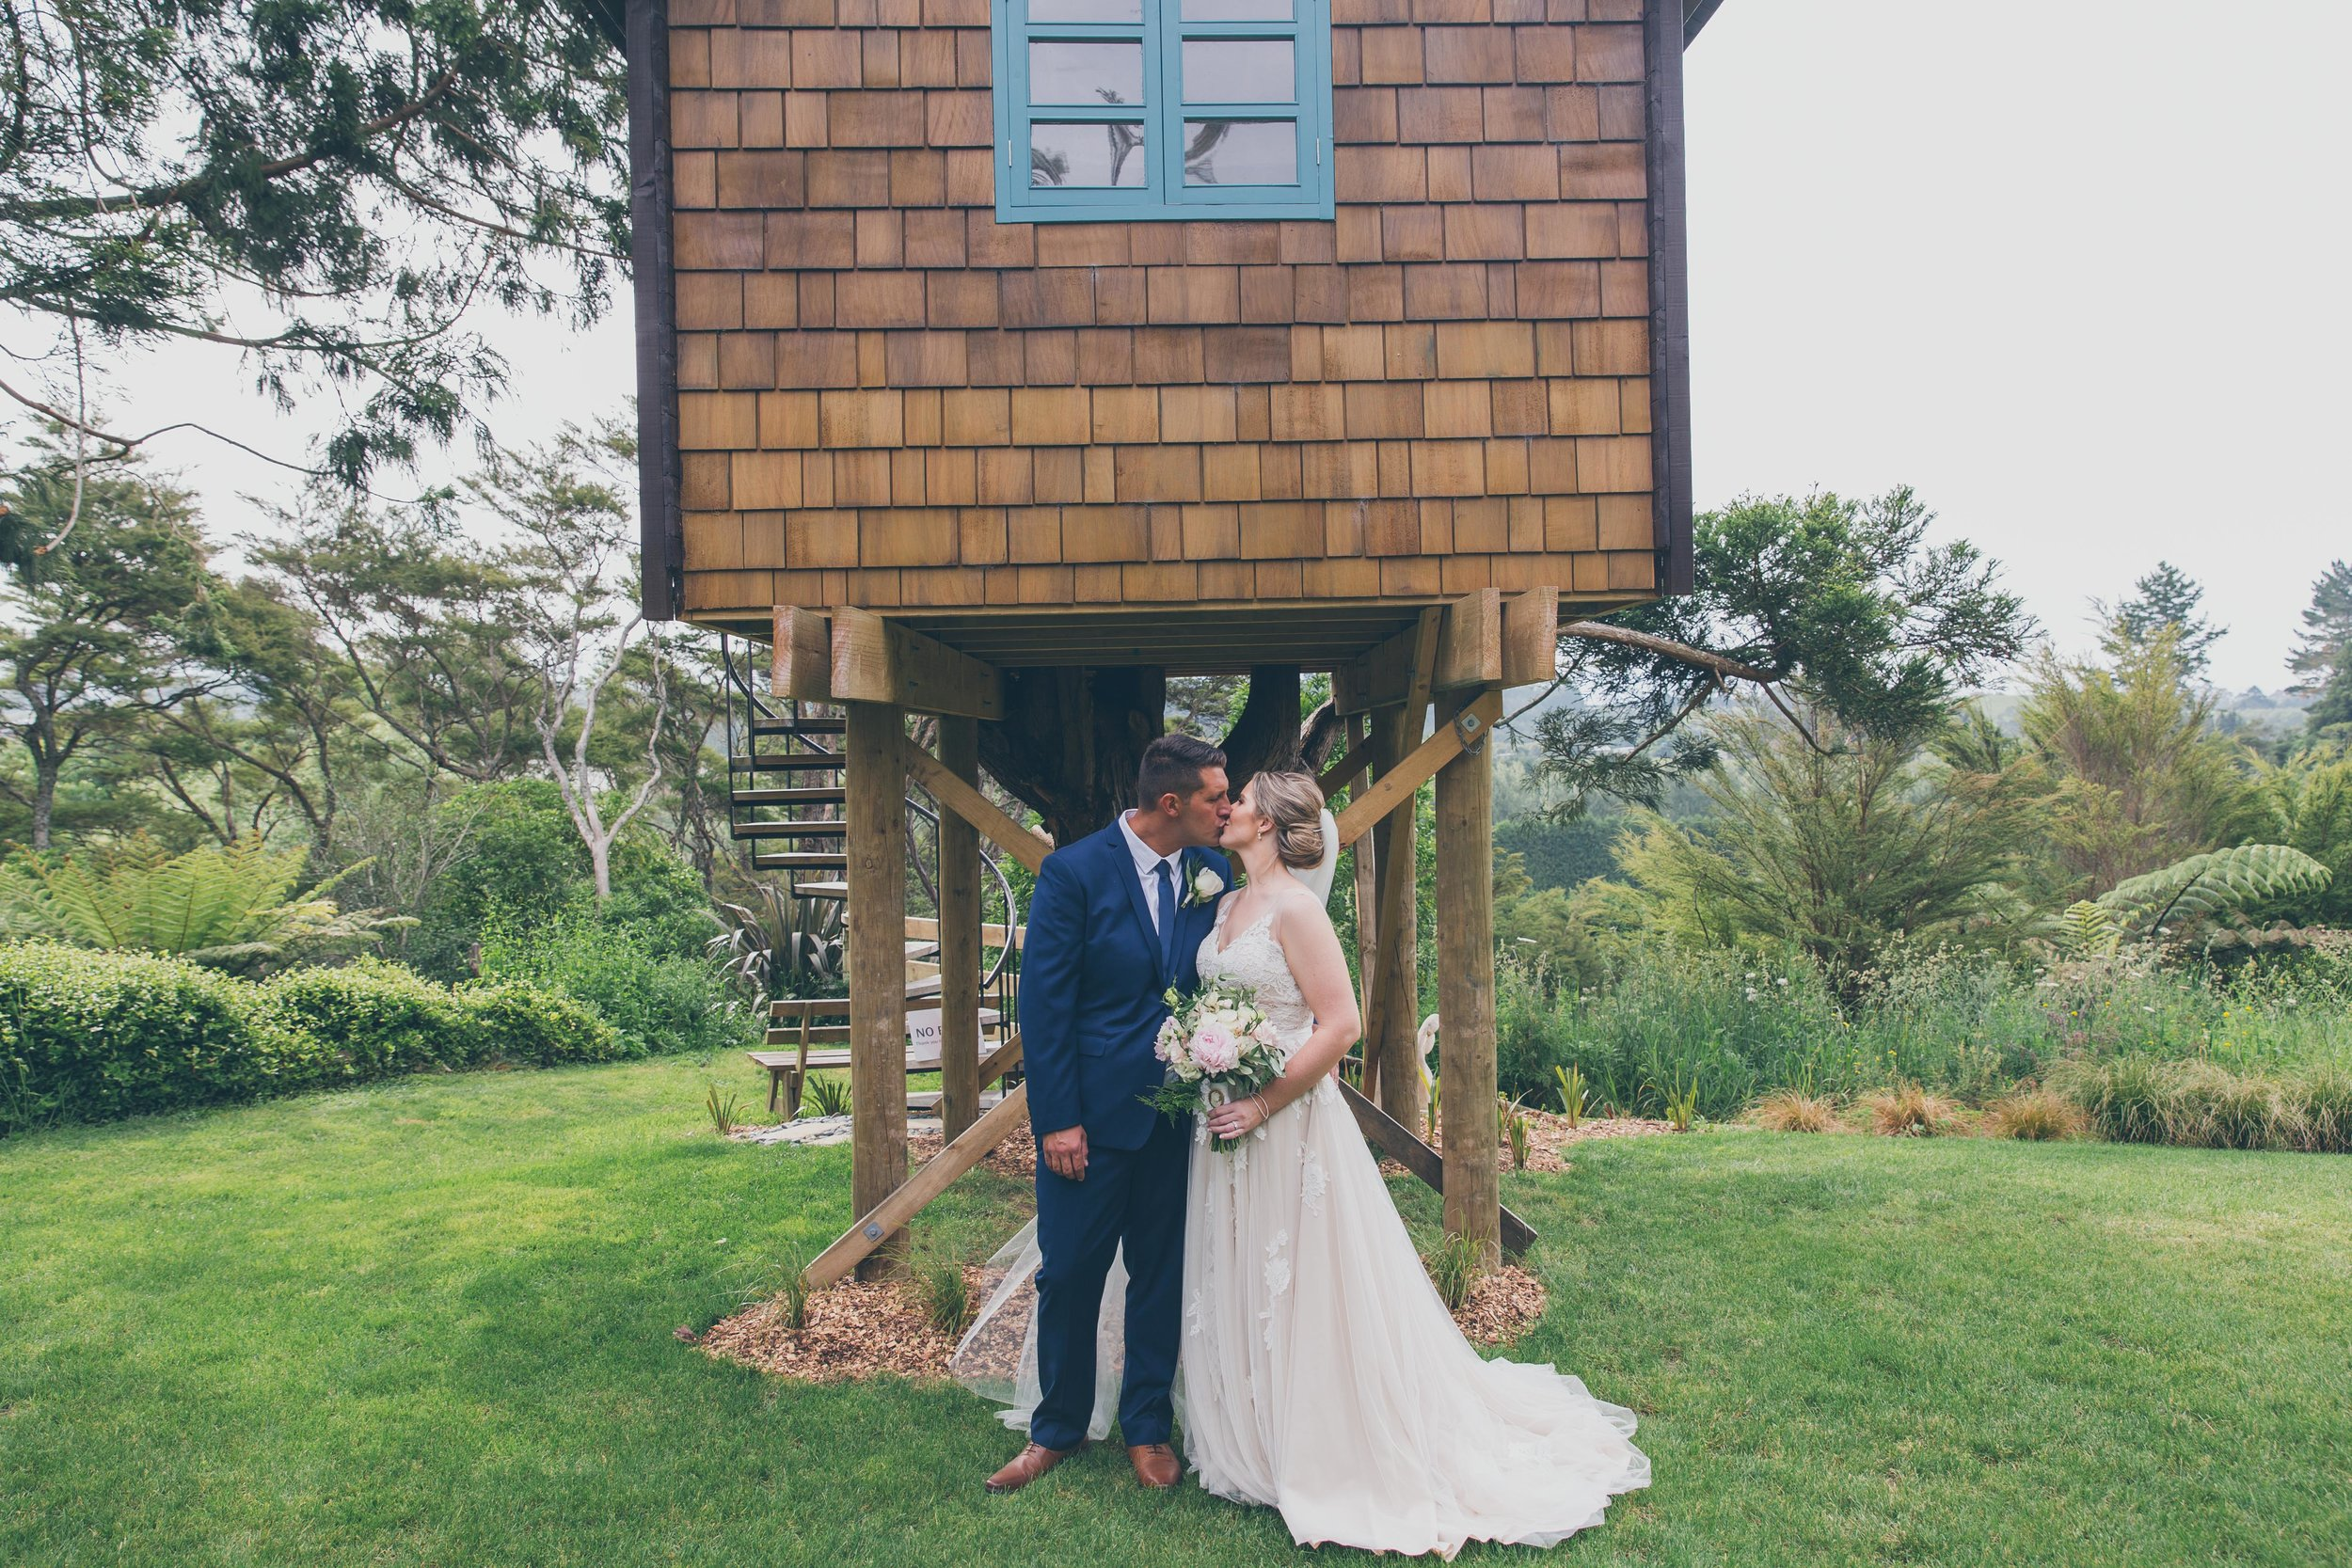 C & J - Wedding - Oh Joy! Photography - Tauranga, New Zealand-5.jpg